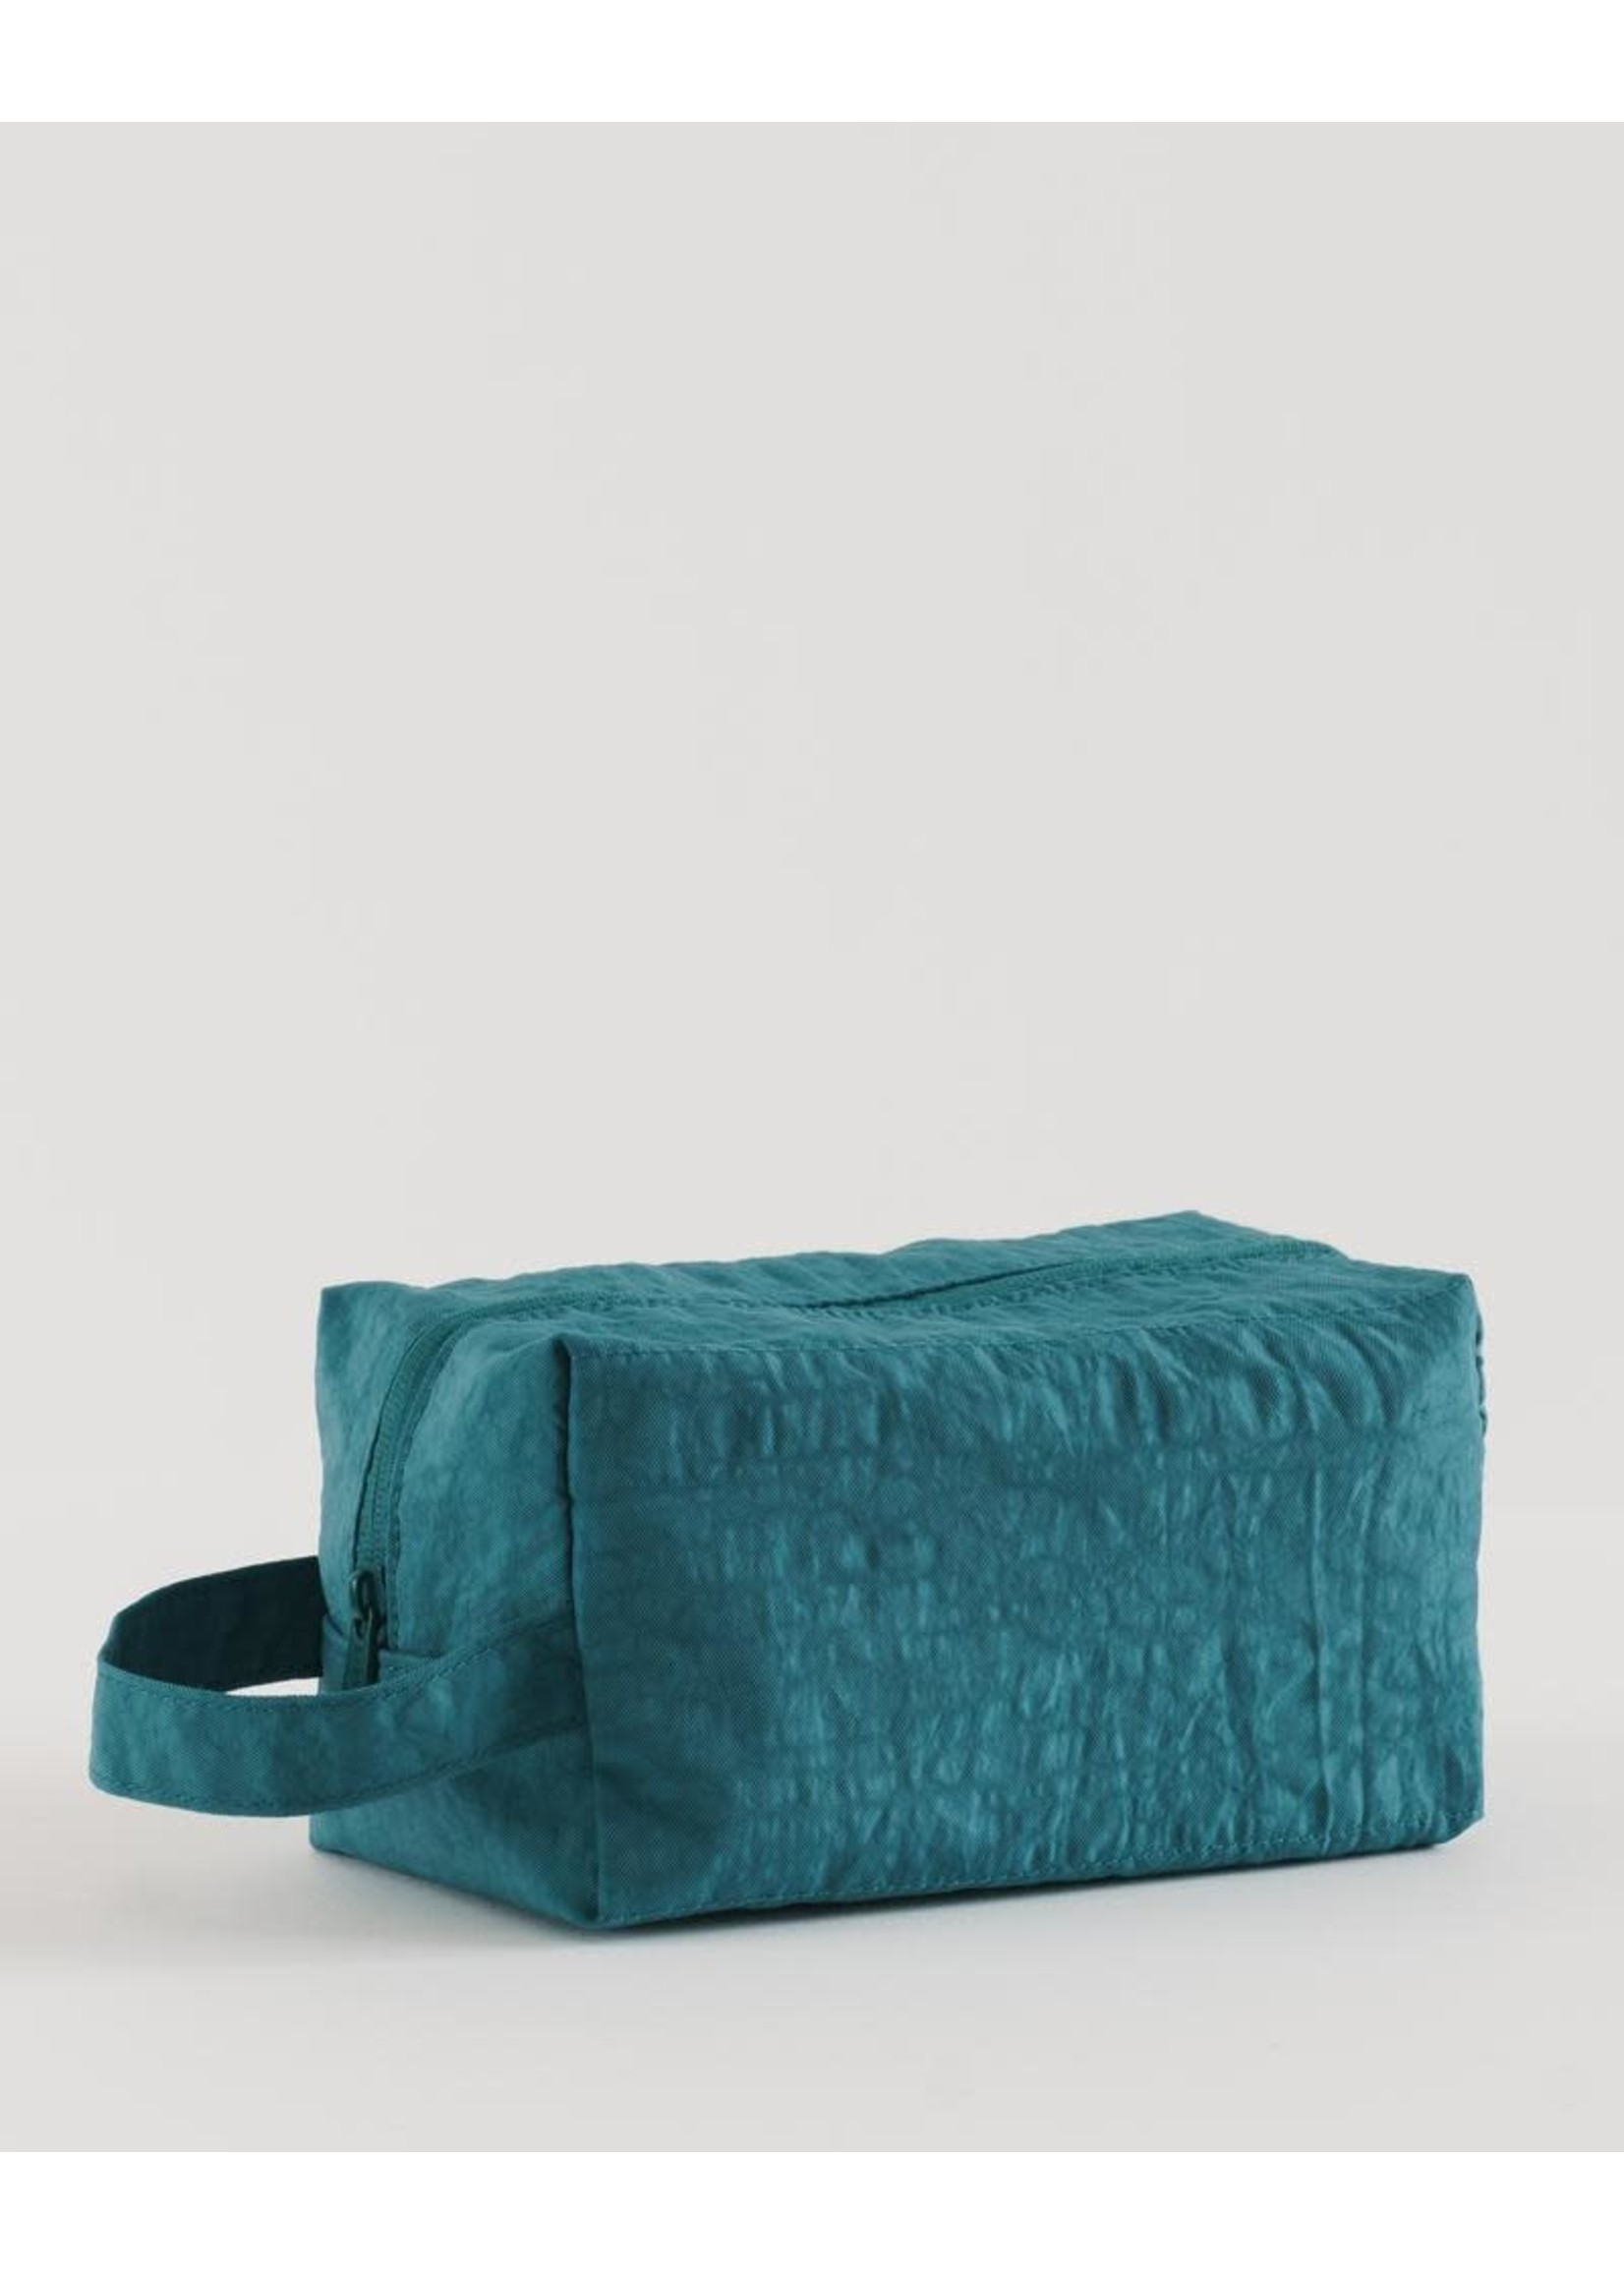 Baggu Baggu Dopp Kit Bag - Malachite